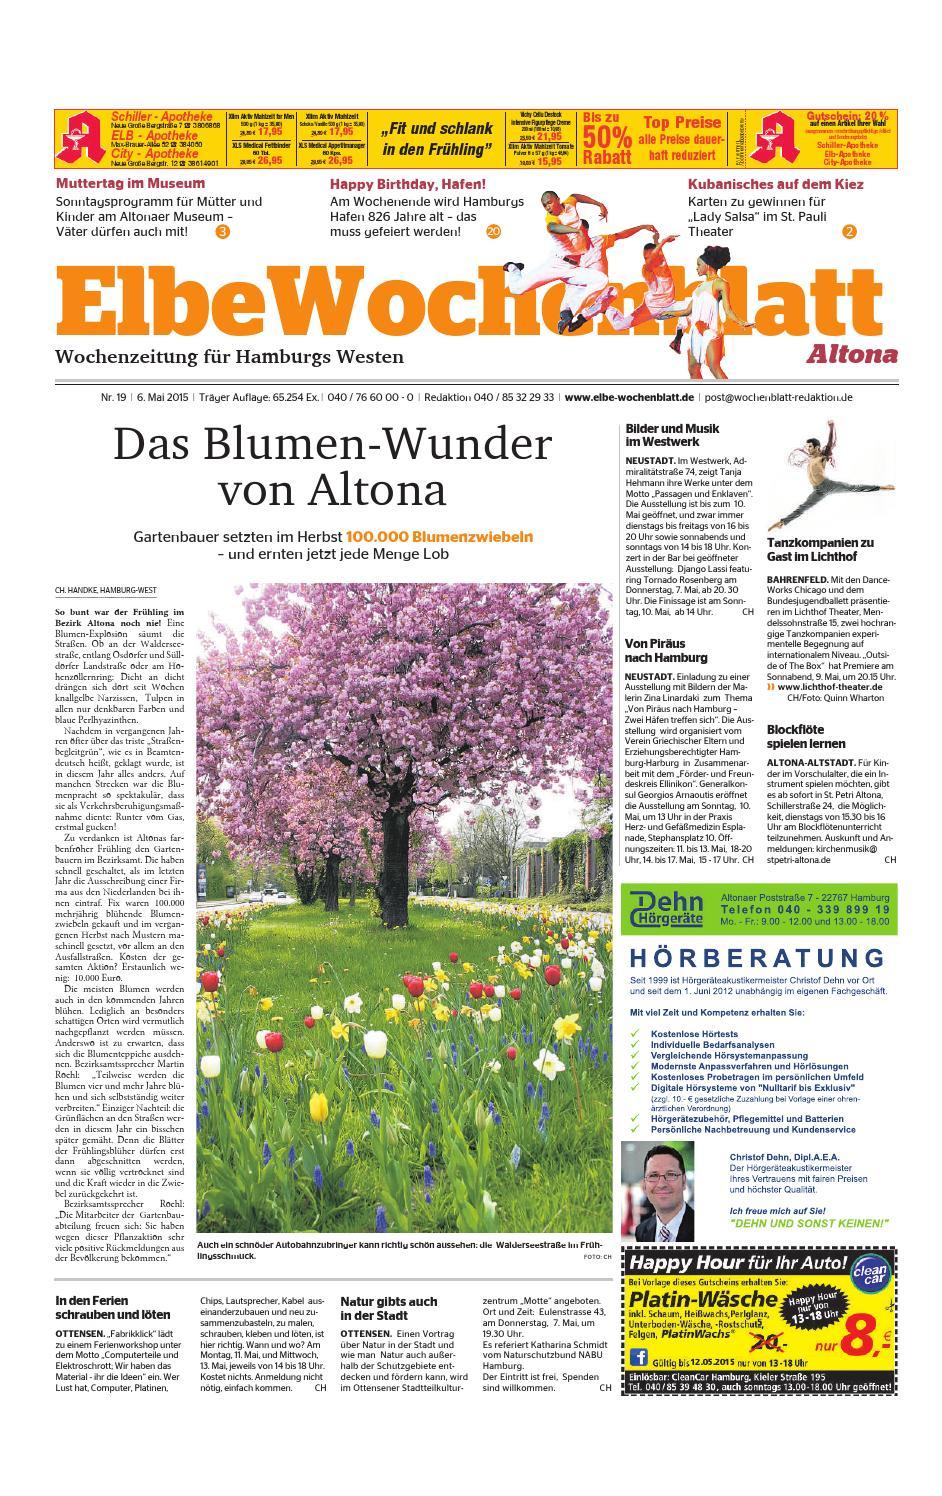 Altona KW19-2015 by Elbe Wochenblatt Verlagsgesellschaft mbH & Co.KG - issuu